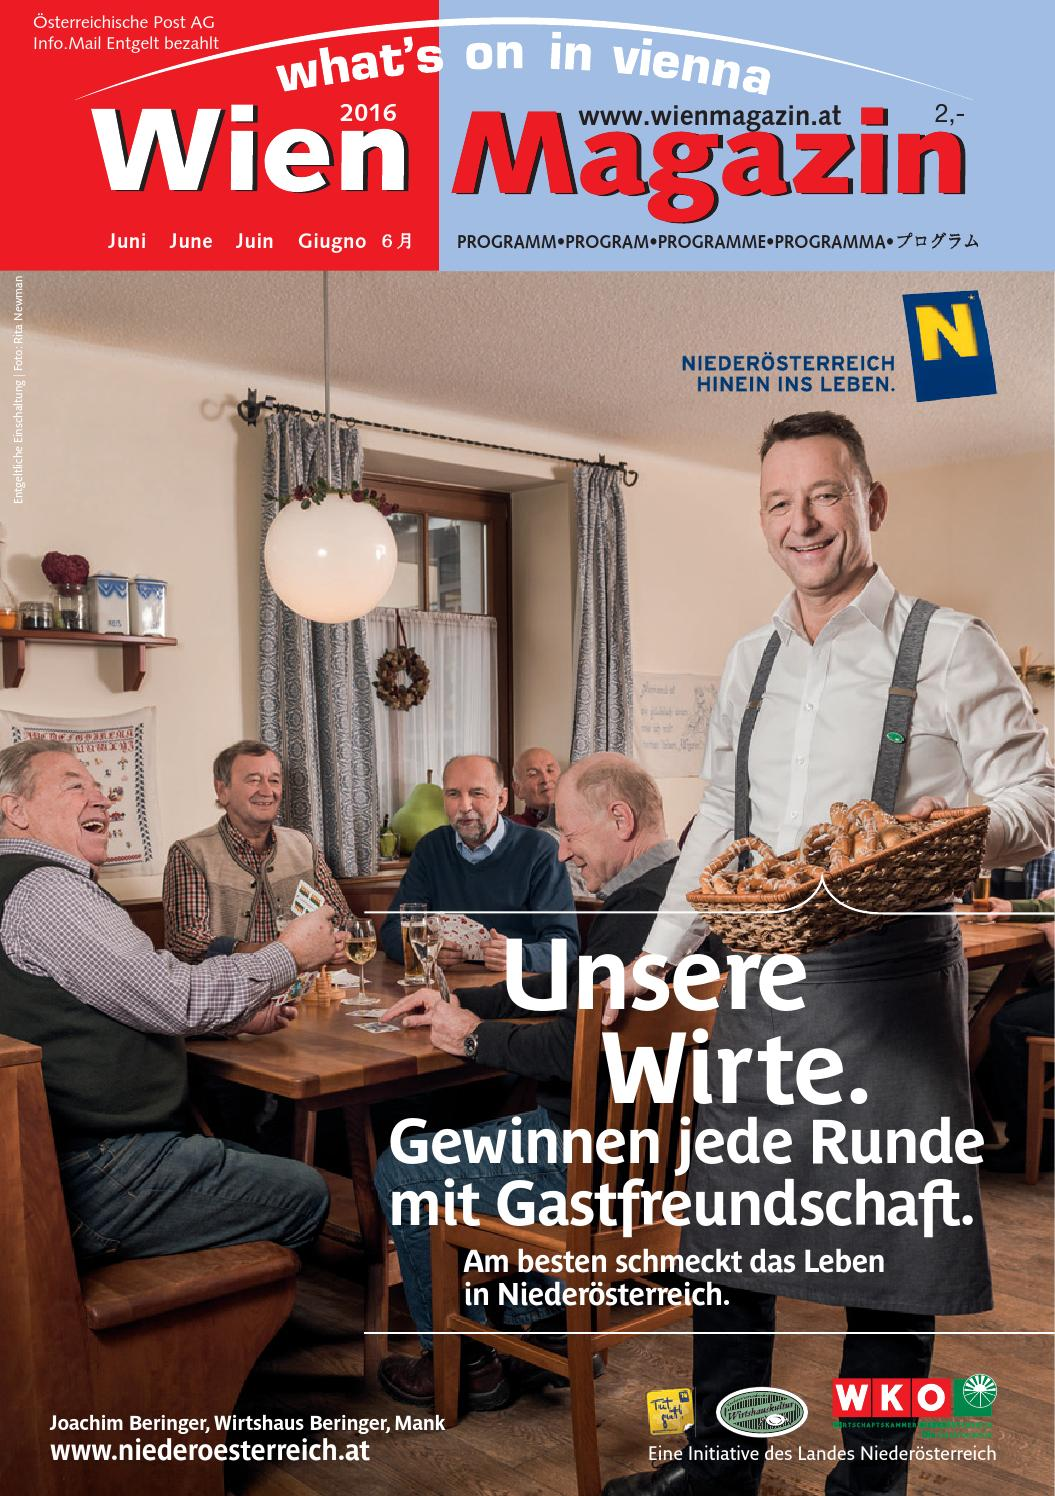 Wien Magazin 8 8 by Waltraud Edelmayer   issuu